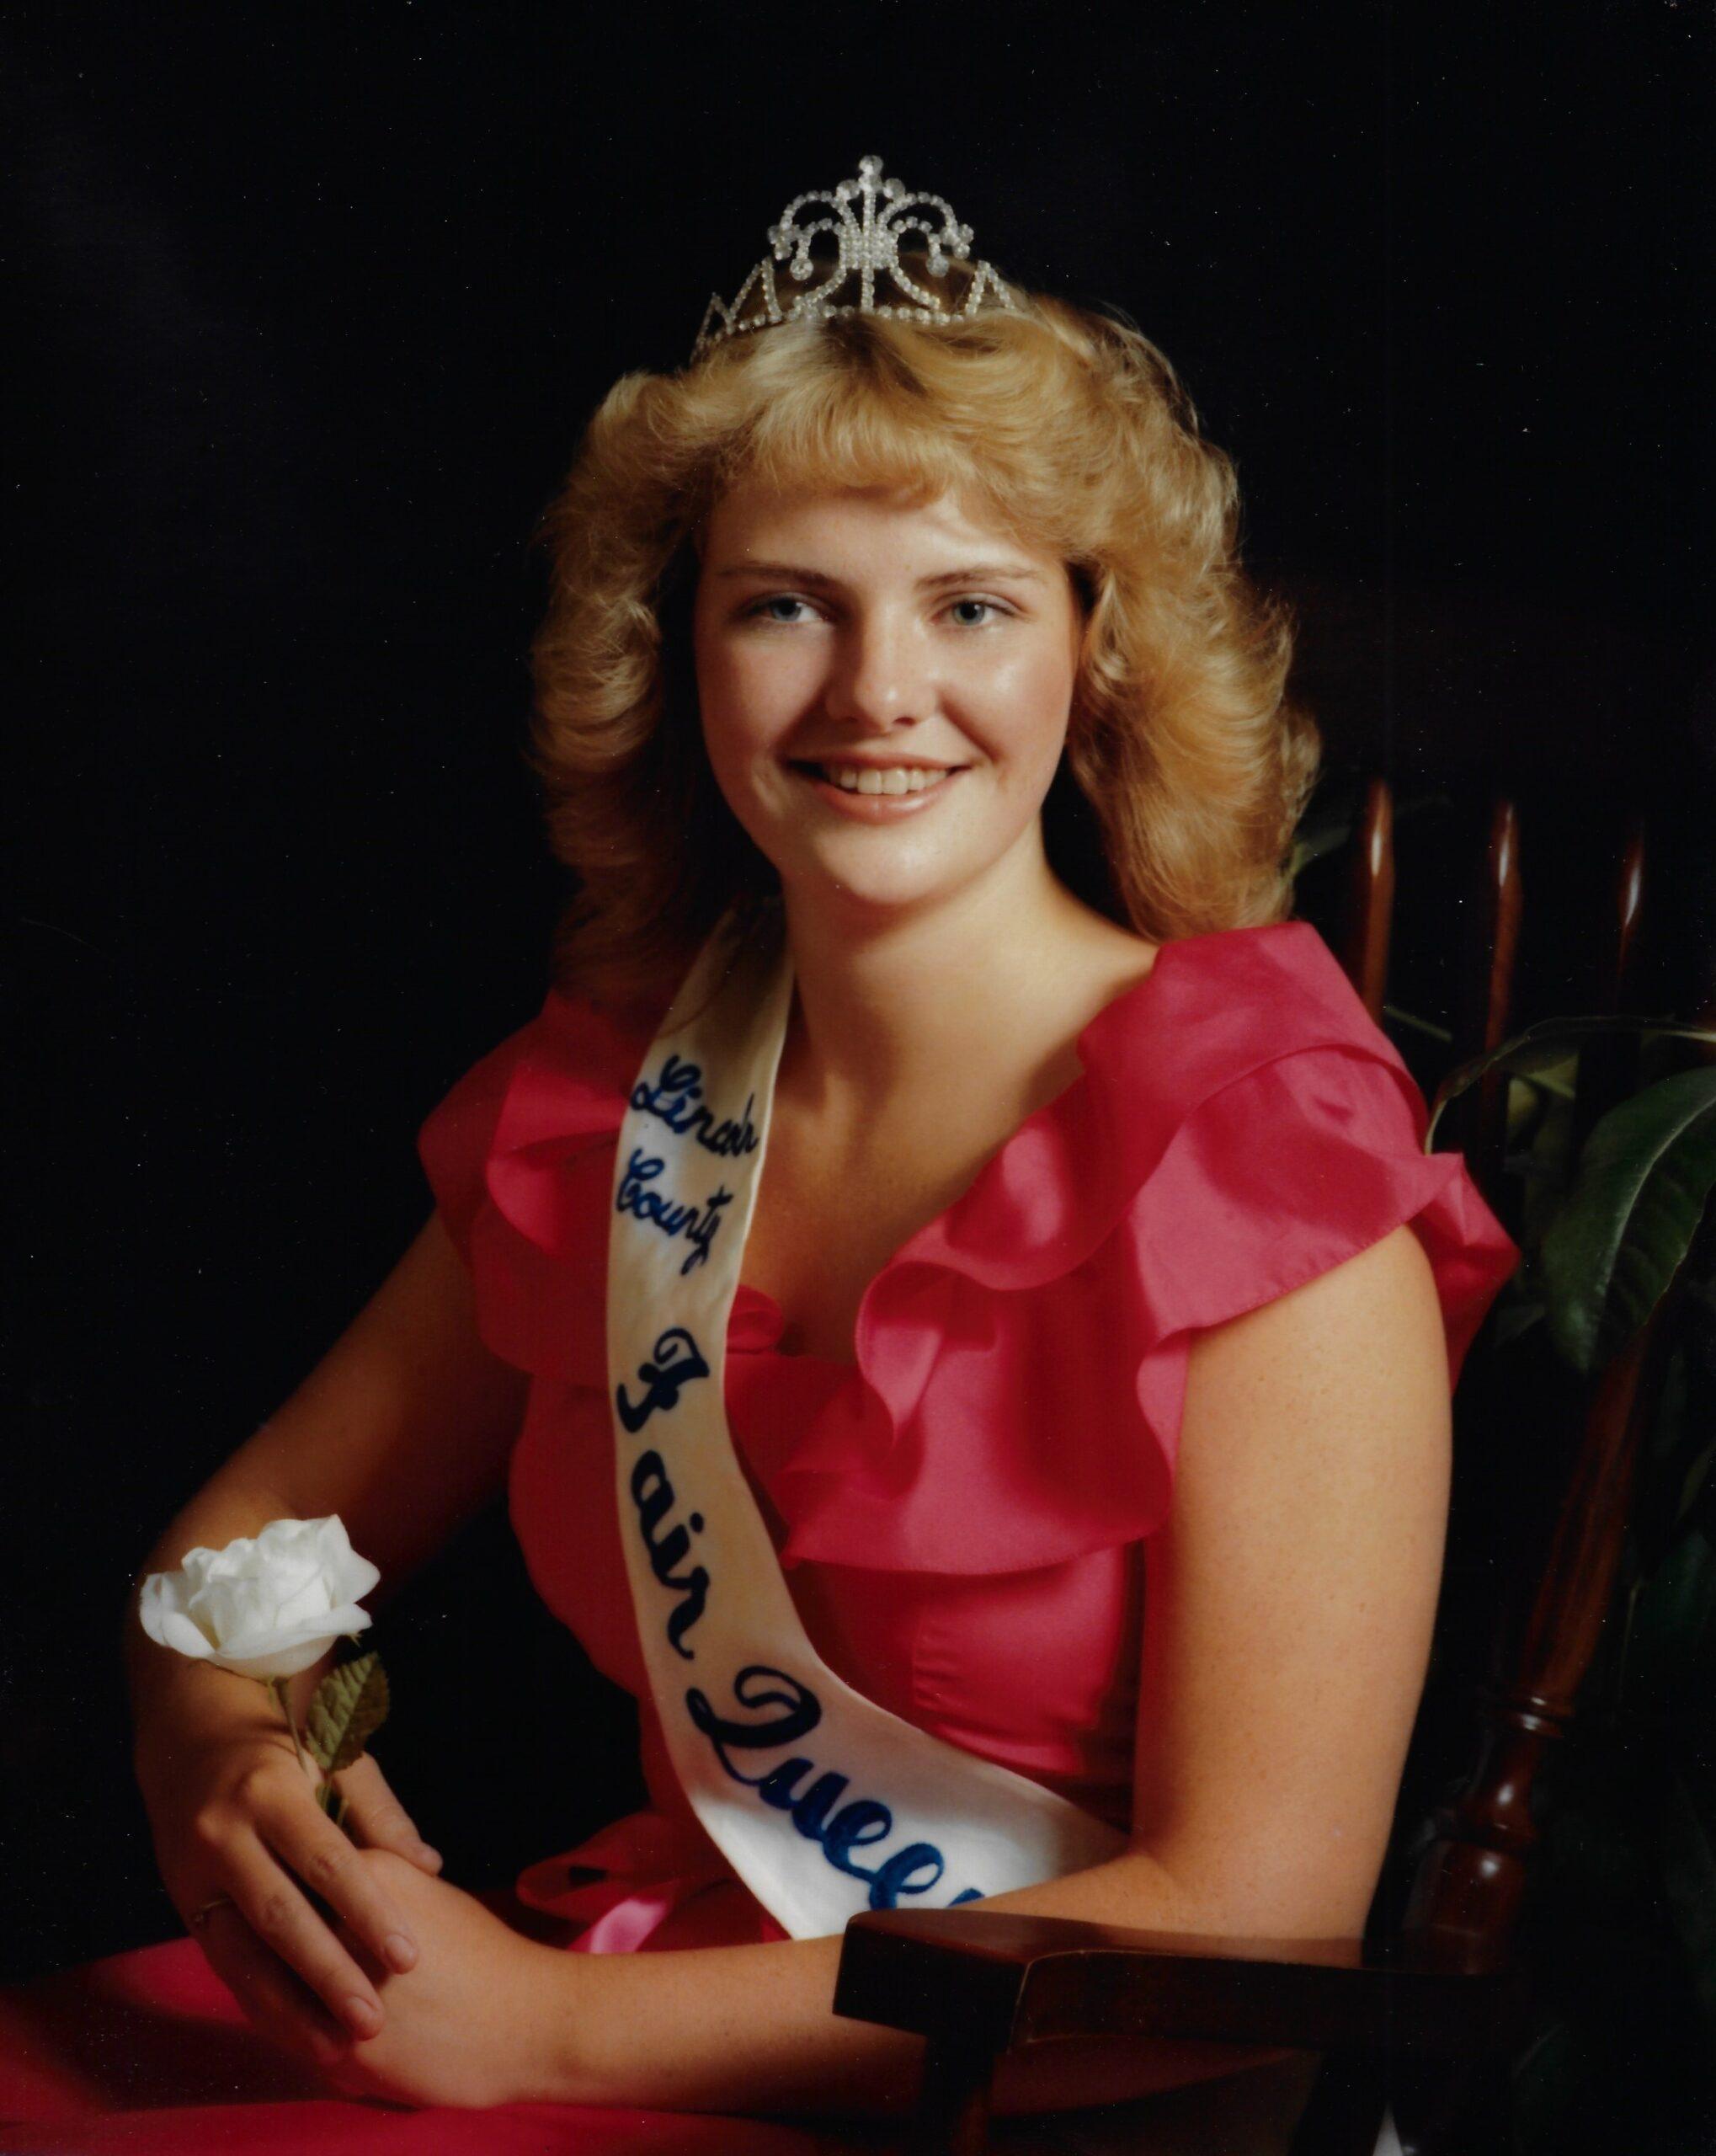 1982 Lincoln County Fair Queen